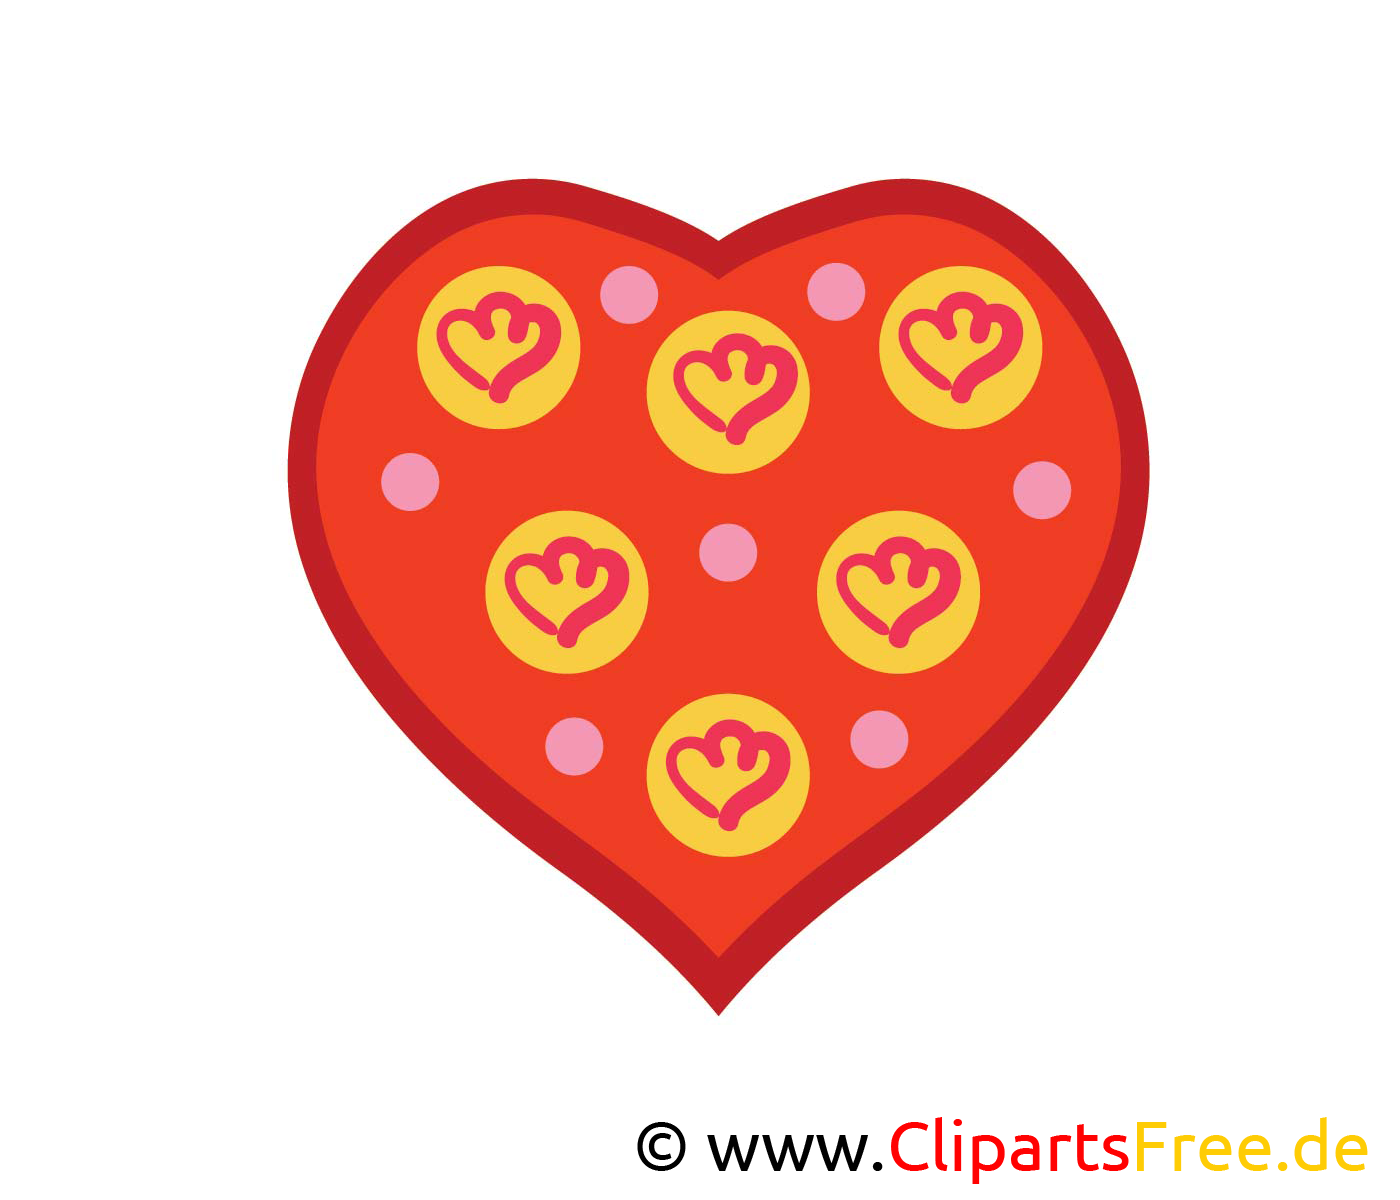 Herz Bild, Clip Art, Image, Grafik, Illustration gratis